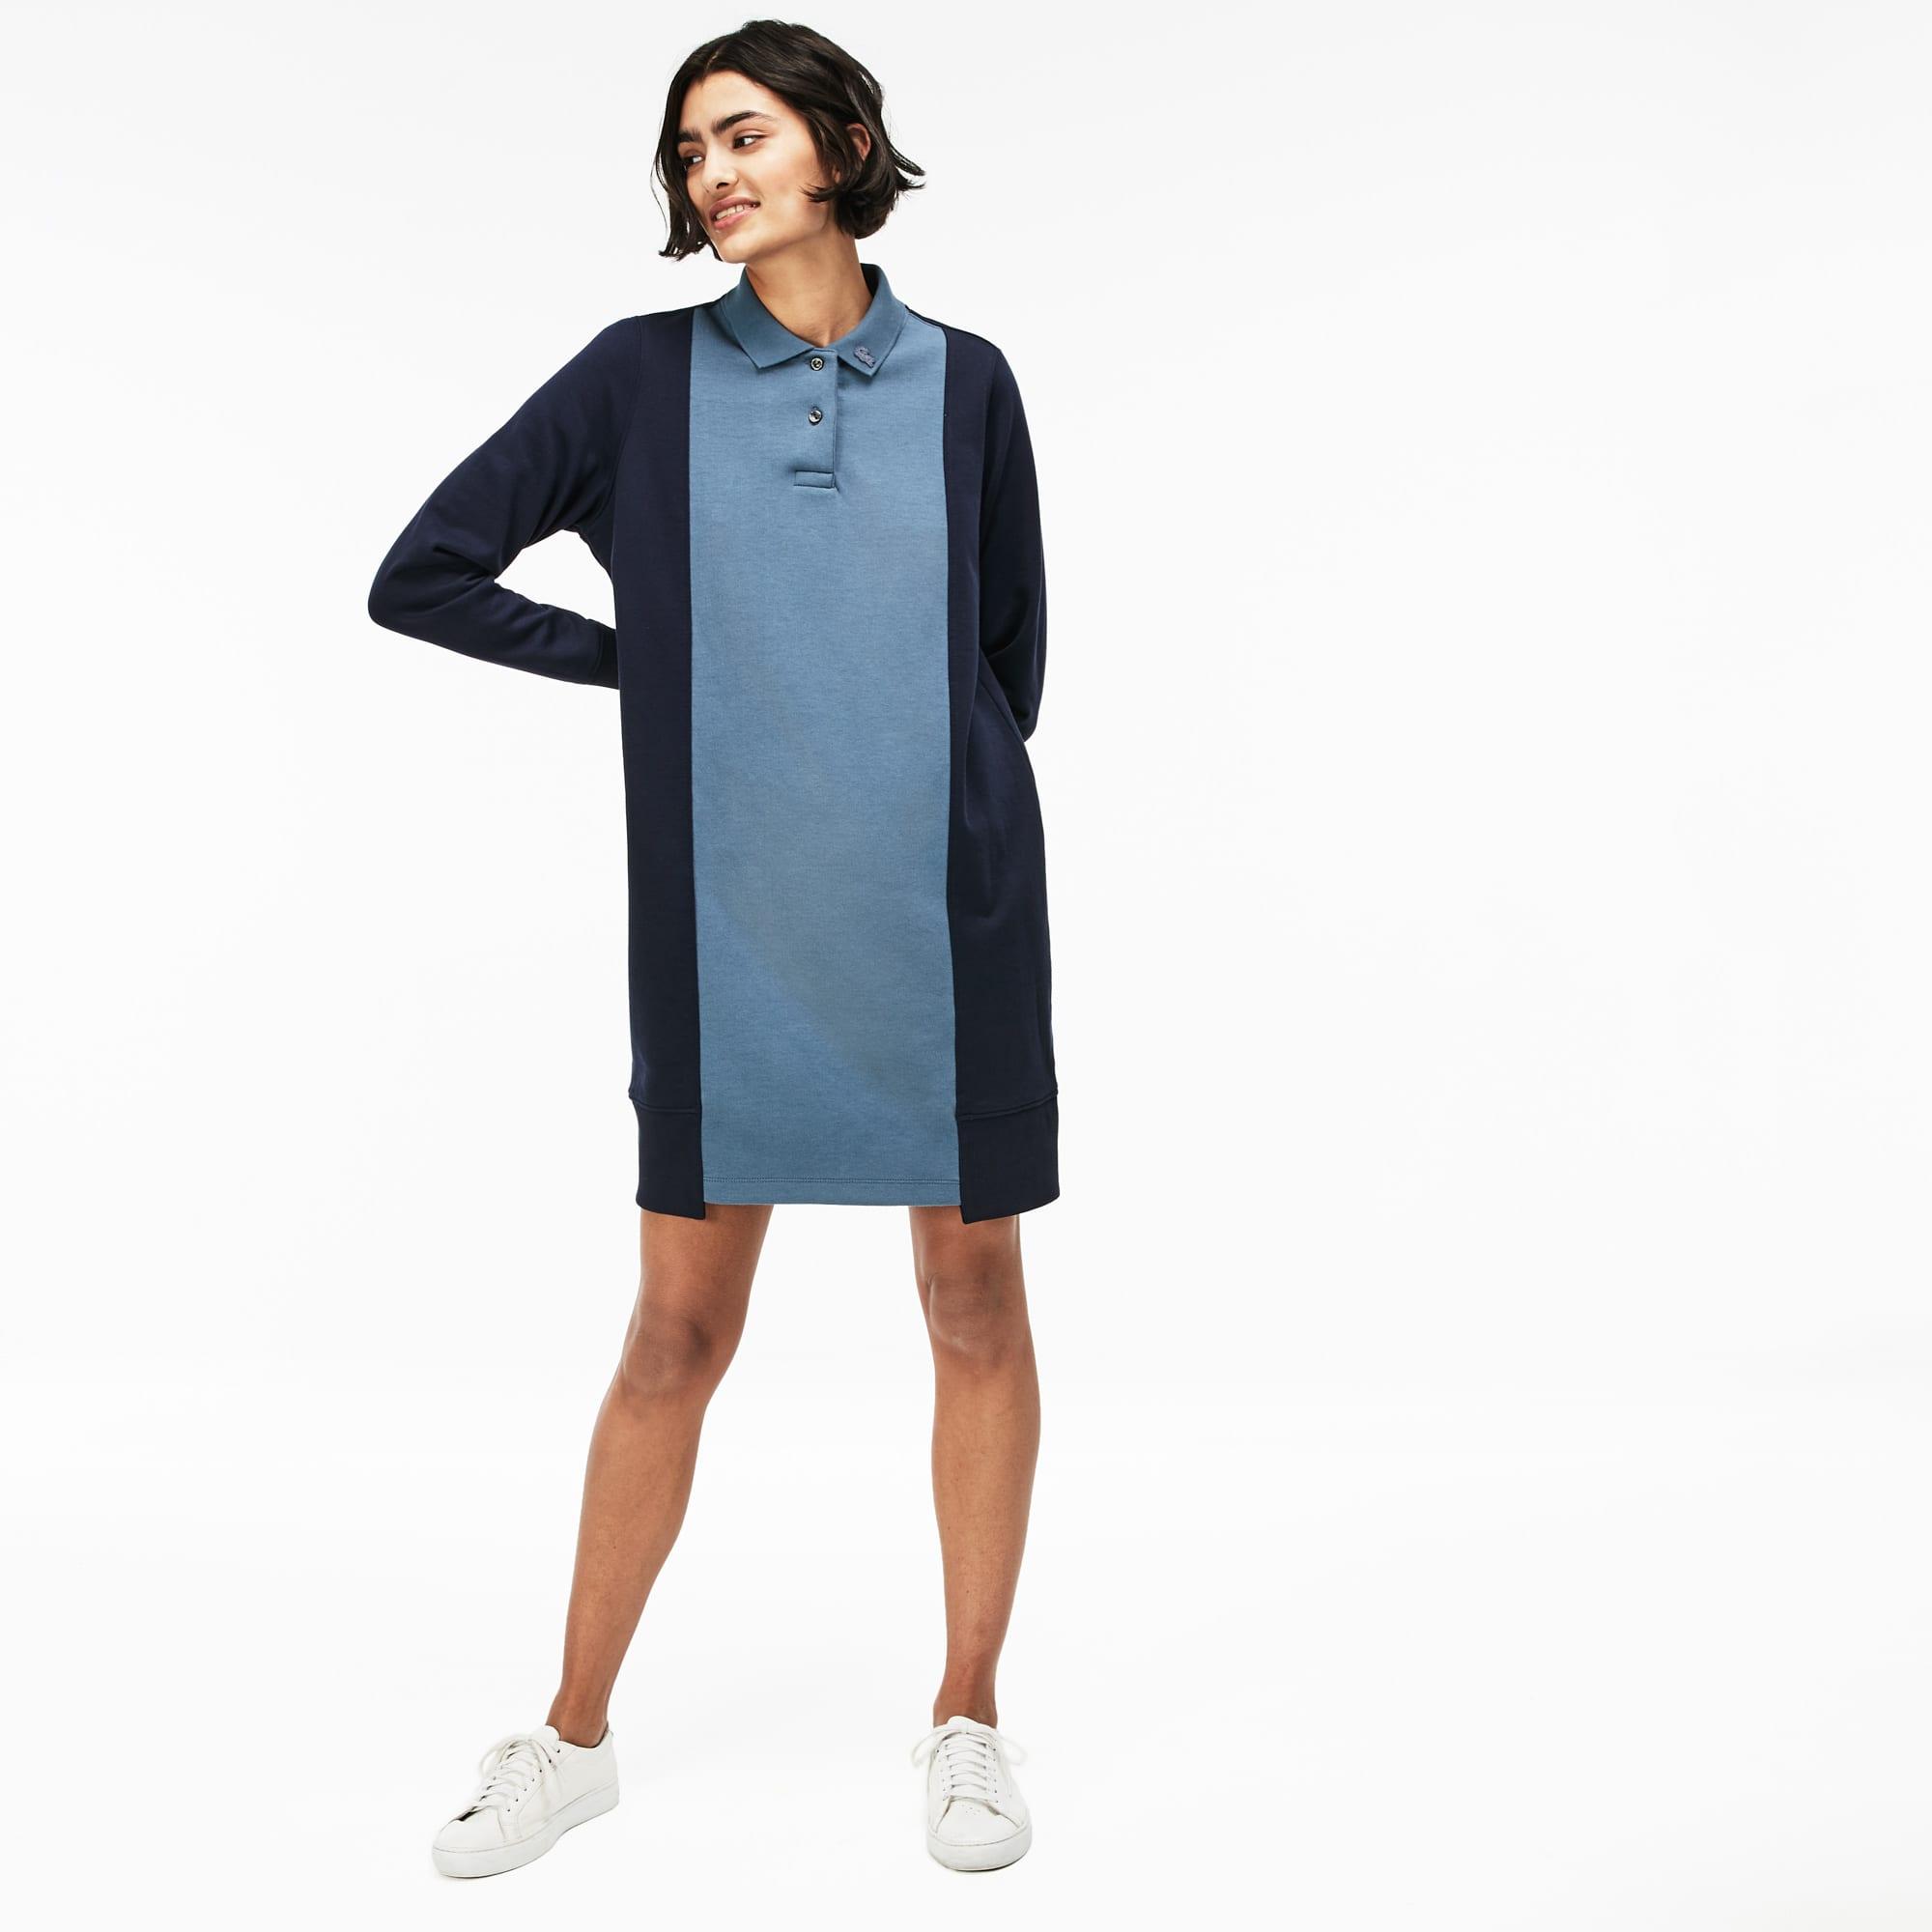 Women's LIVE Contrast Panels Fleece Polo Dress